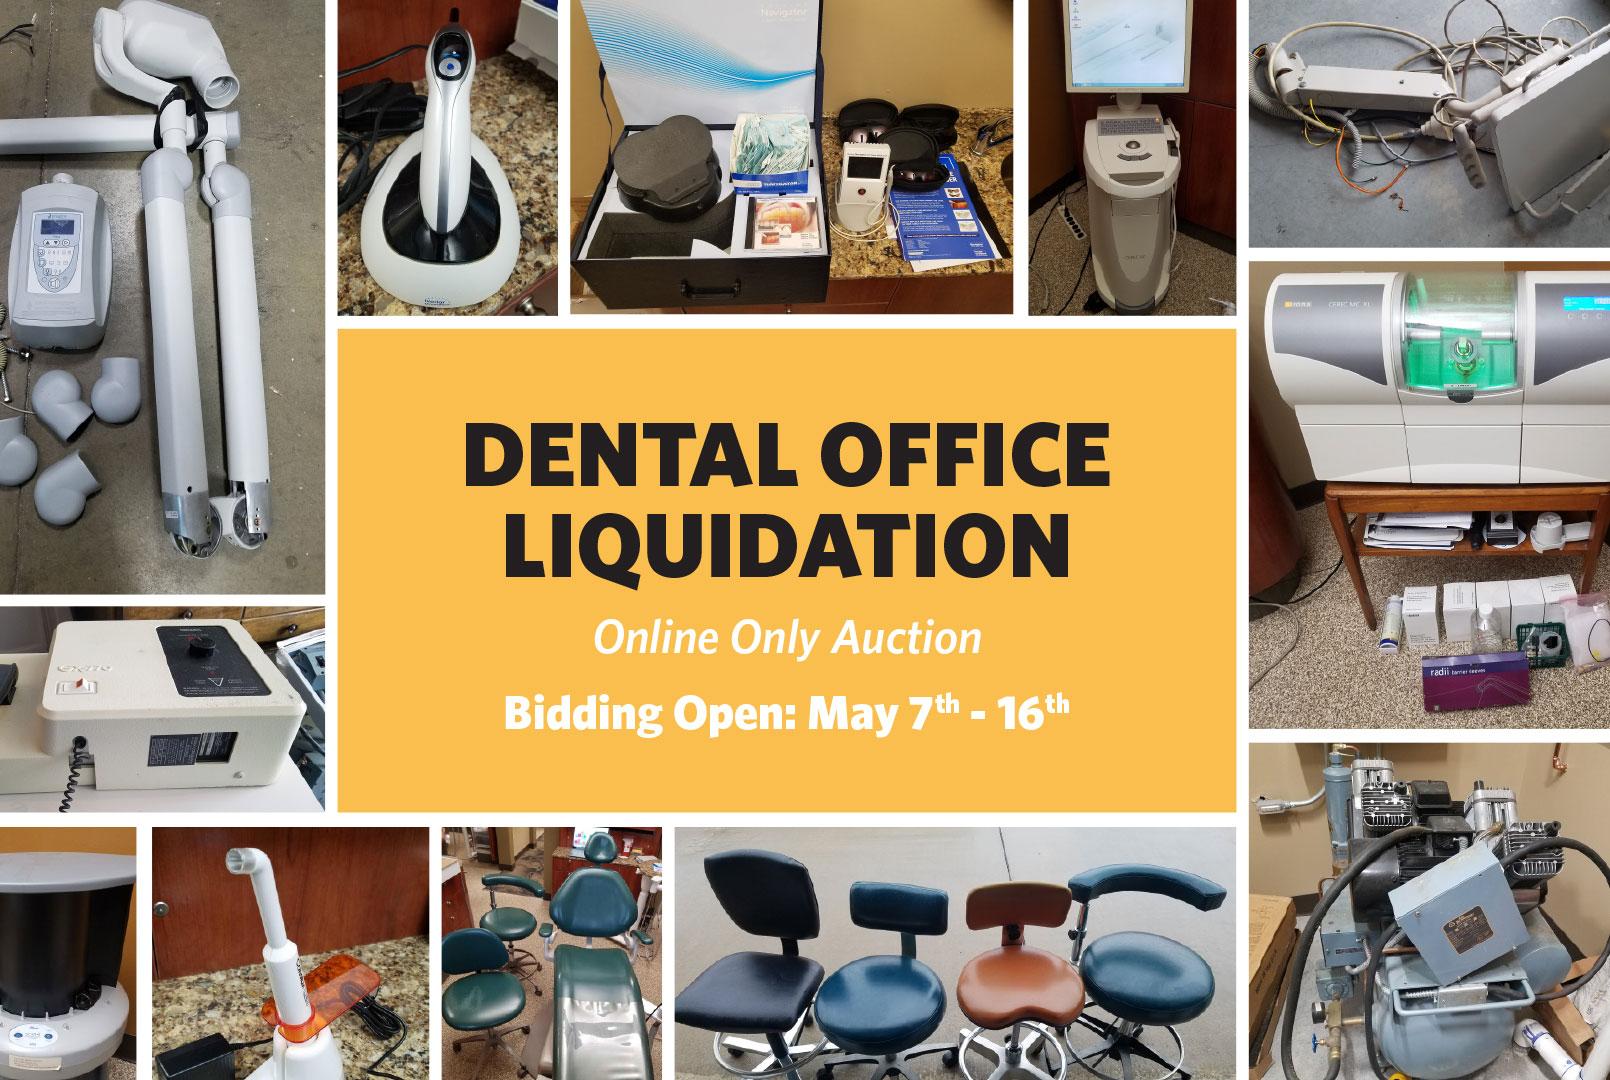 McCurdy Auction - Dental Office Liquidation